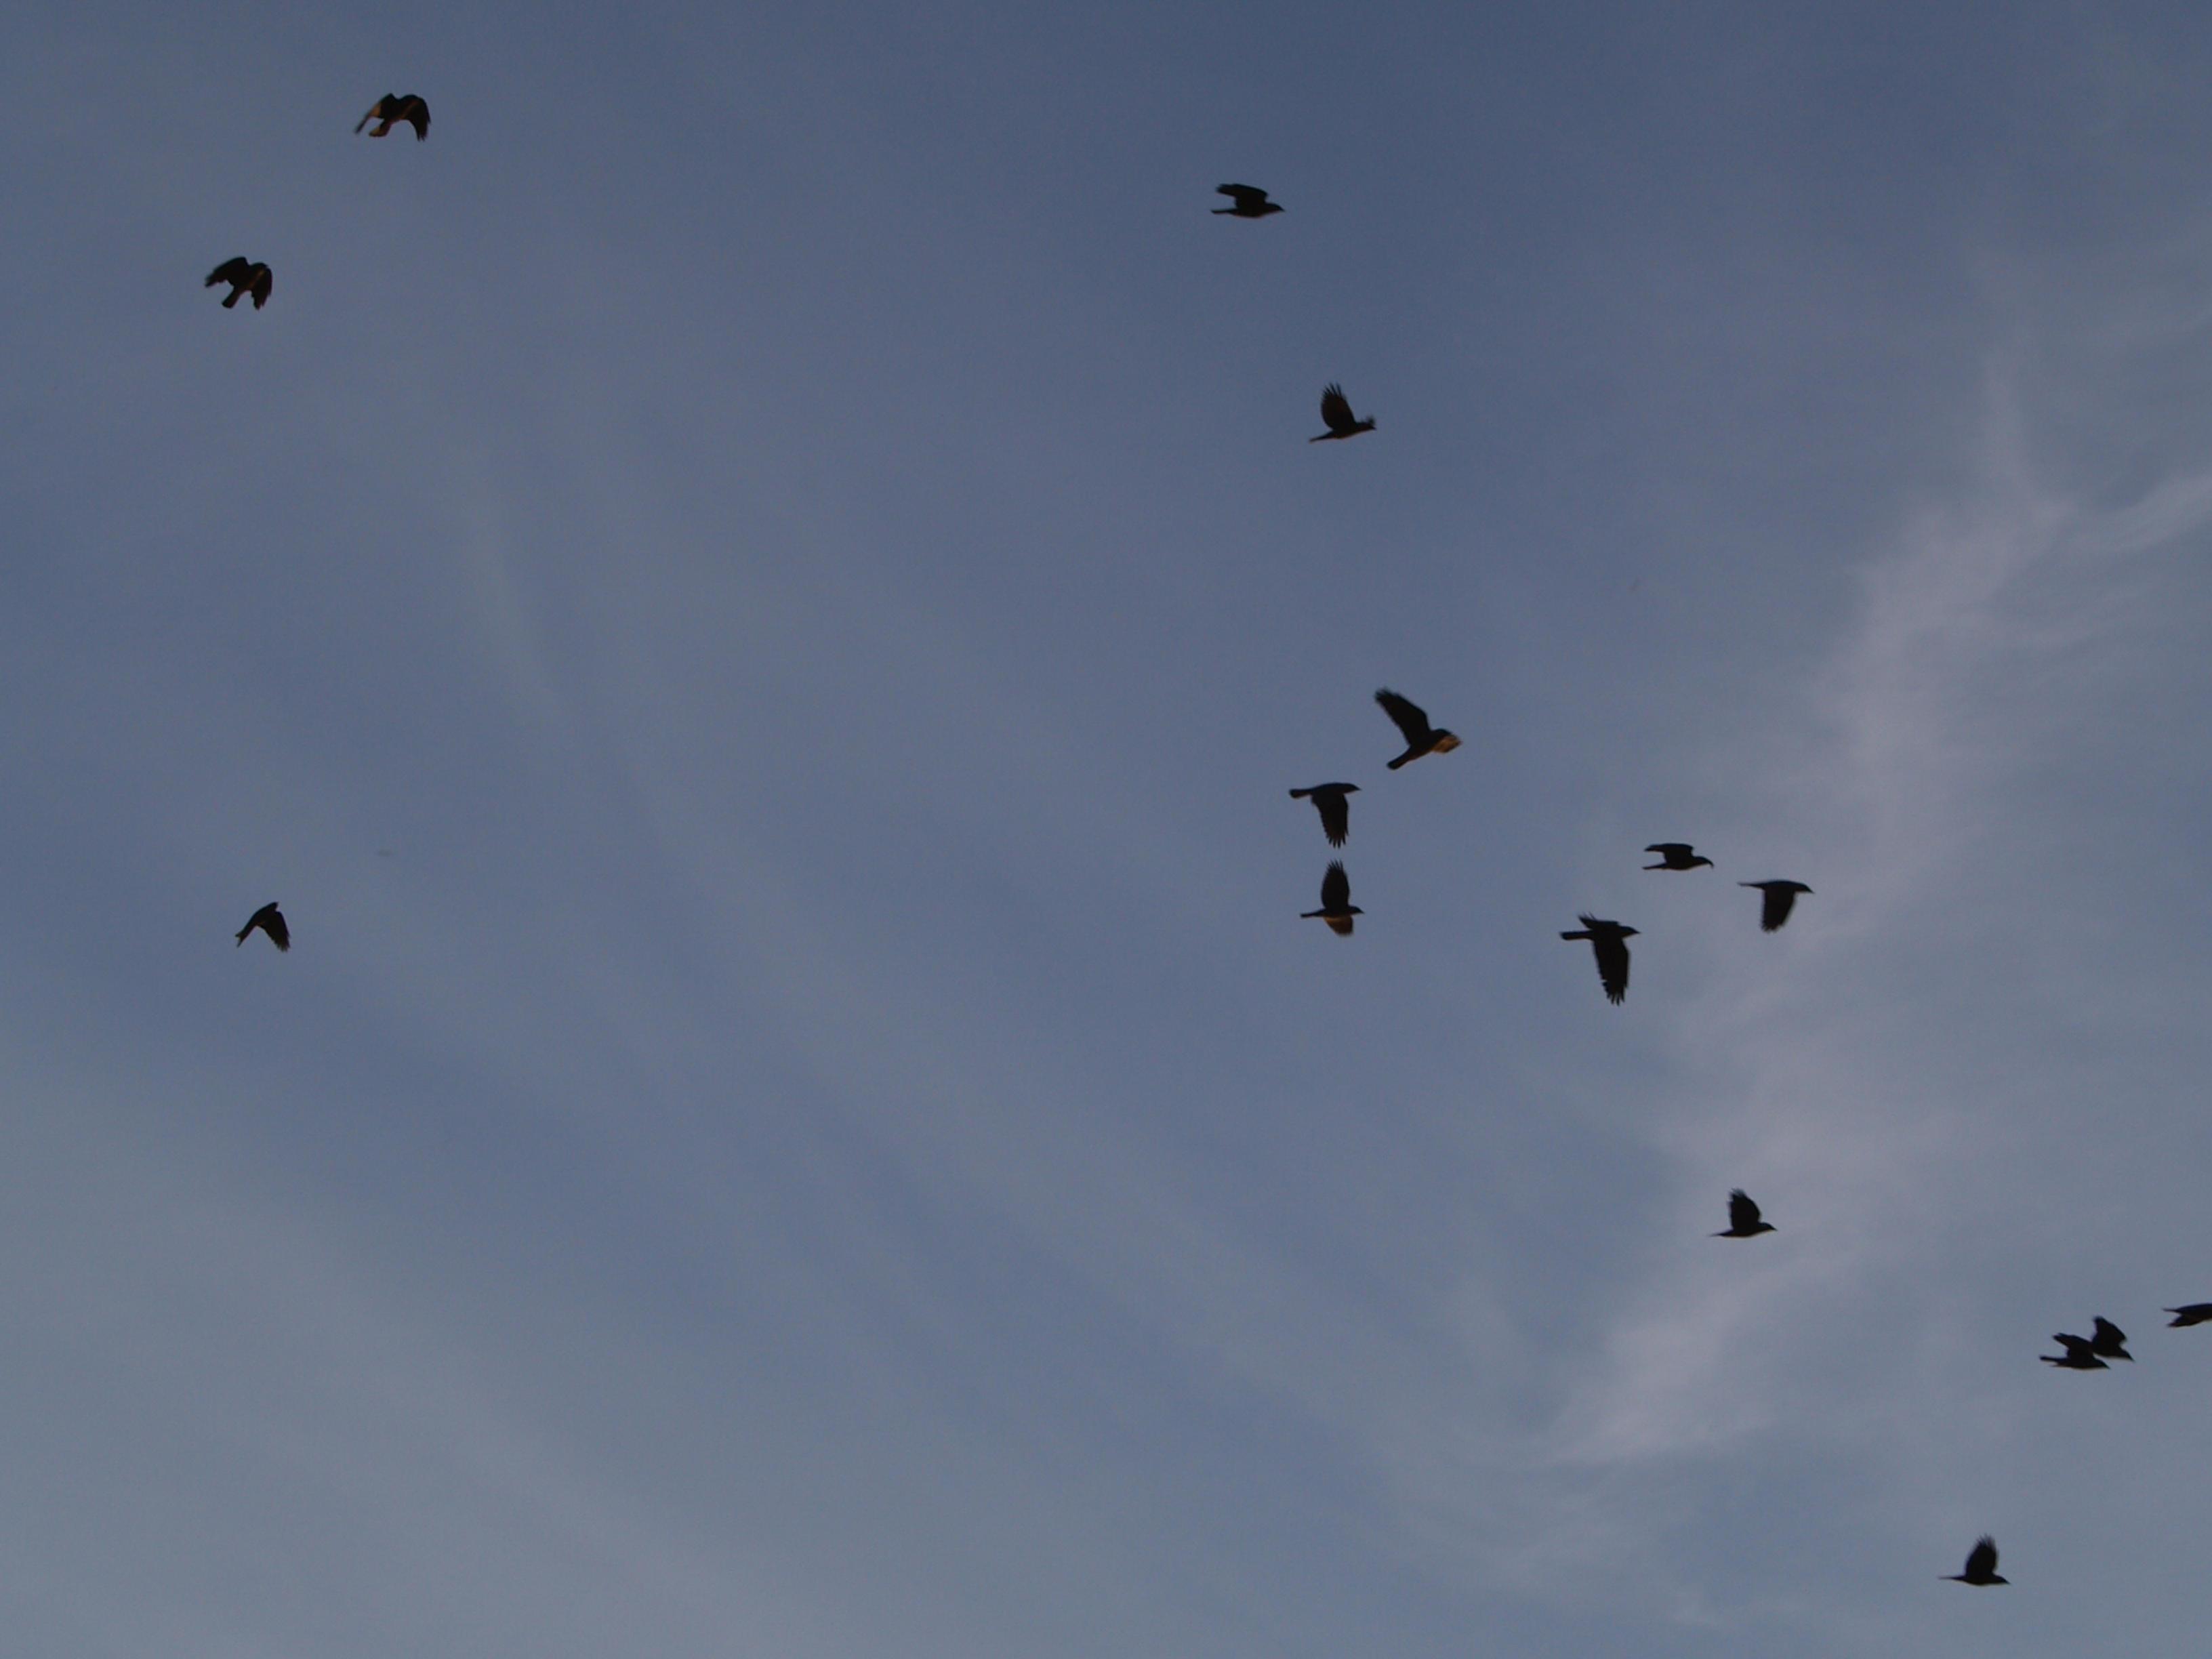 birds in the sky 1 by akinna-stock